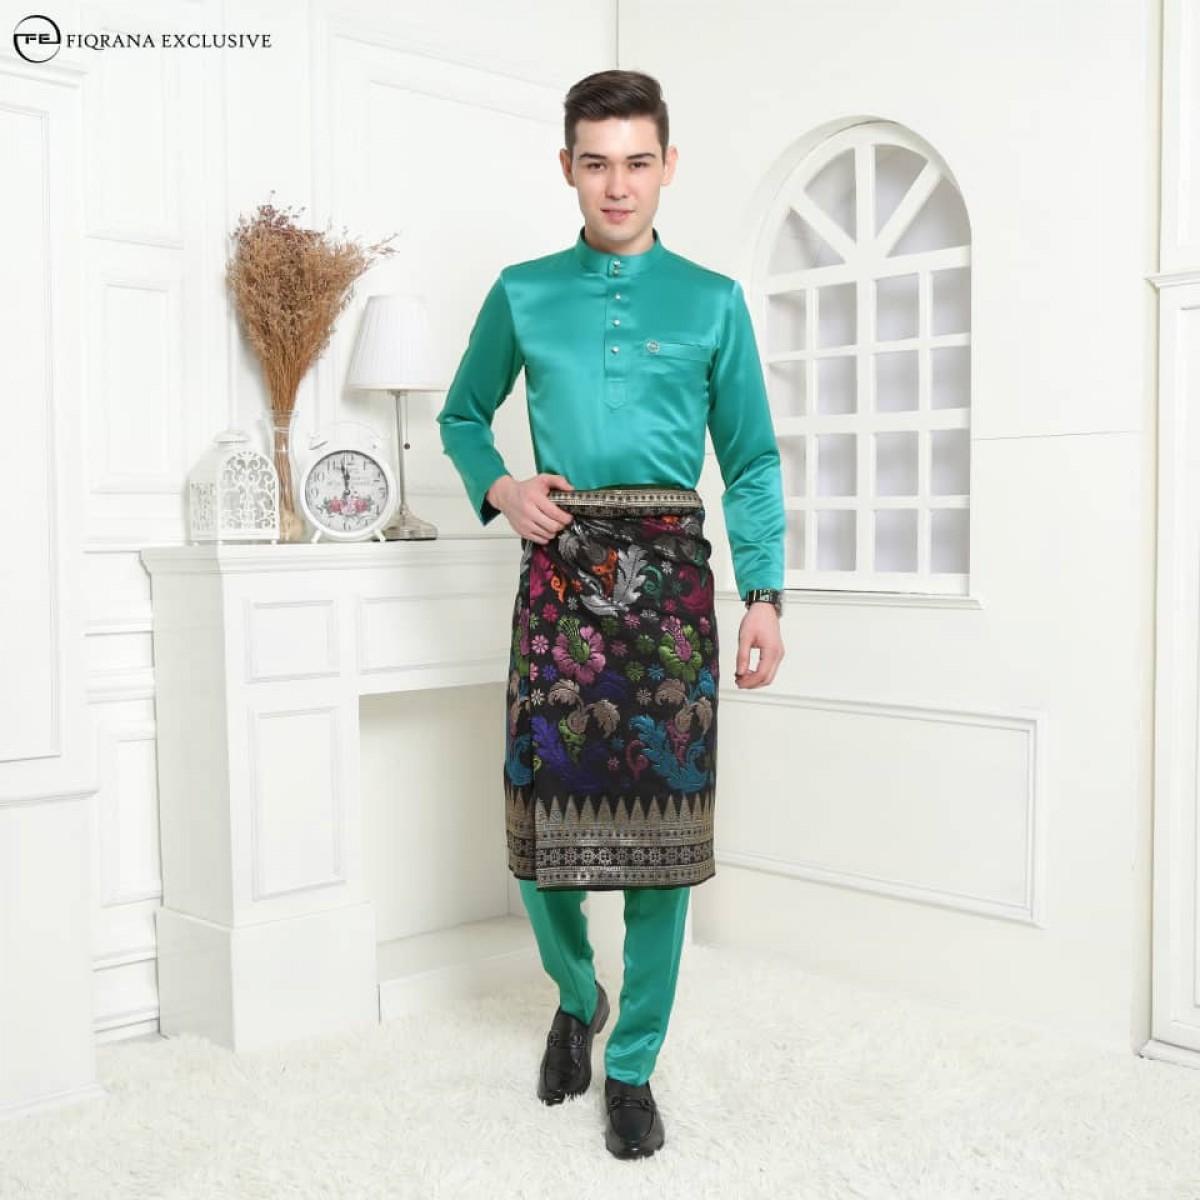 Baju Melayu Slimfit Teal Green - Fiqrana Exclusive